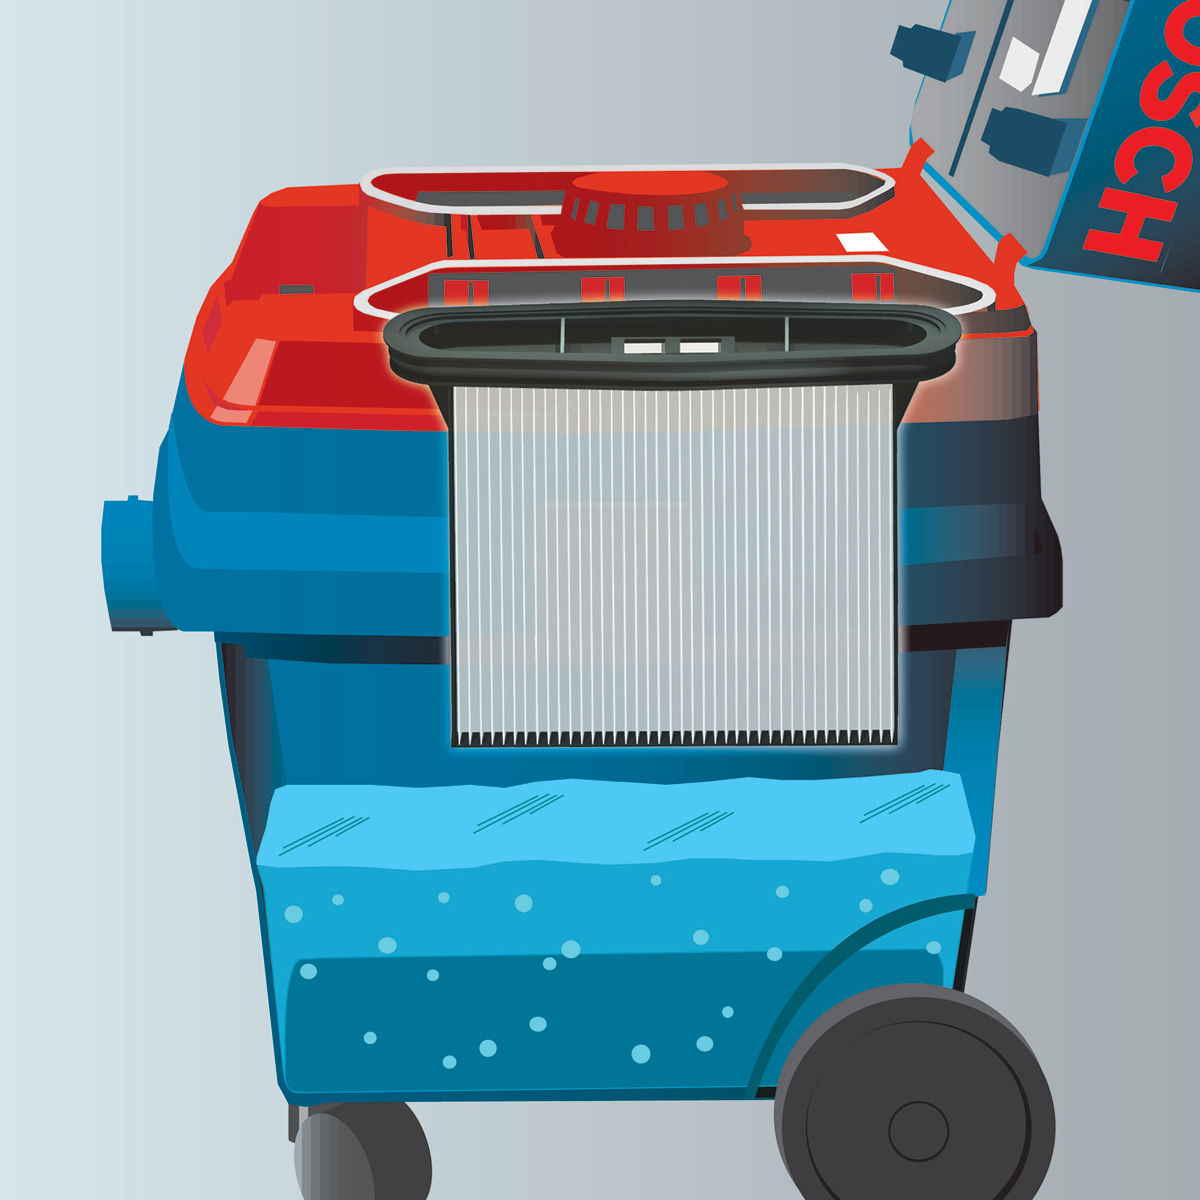 Bosch Gas 20 Sfc Wet And Dry Vacuum Cleaner Daftar Harga Terbaru High Pressure Listrik Ghp 5 55 Gas25 L All Purpose Dust Extractor